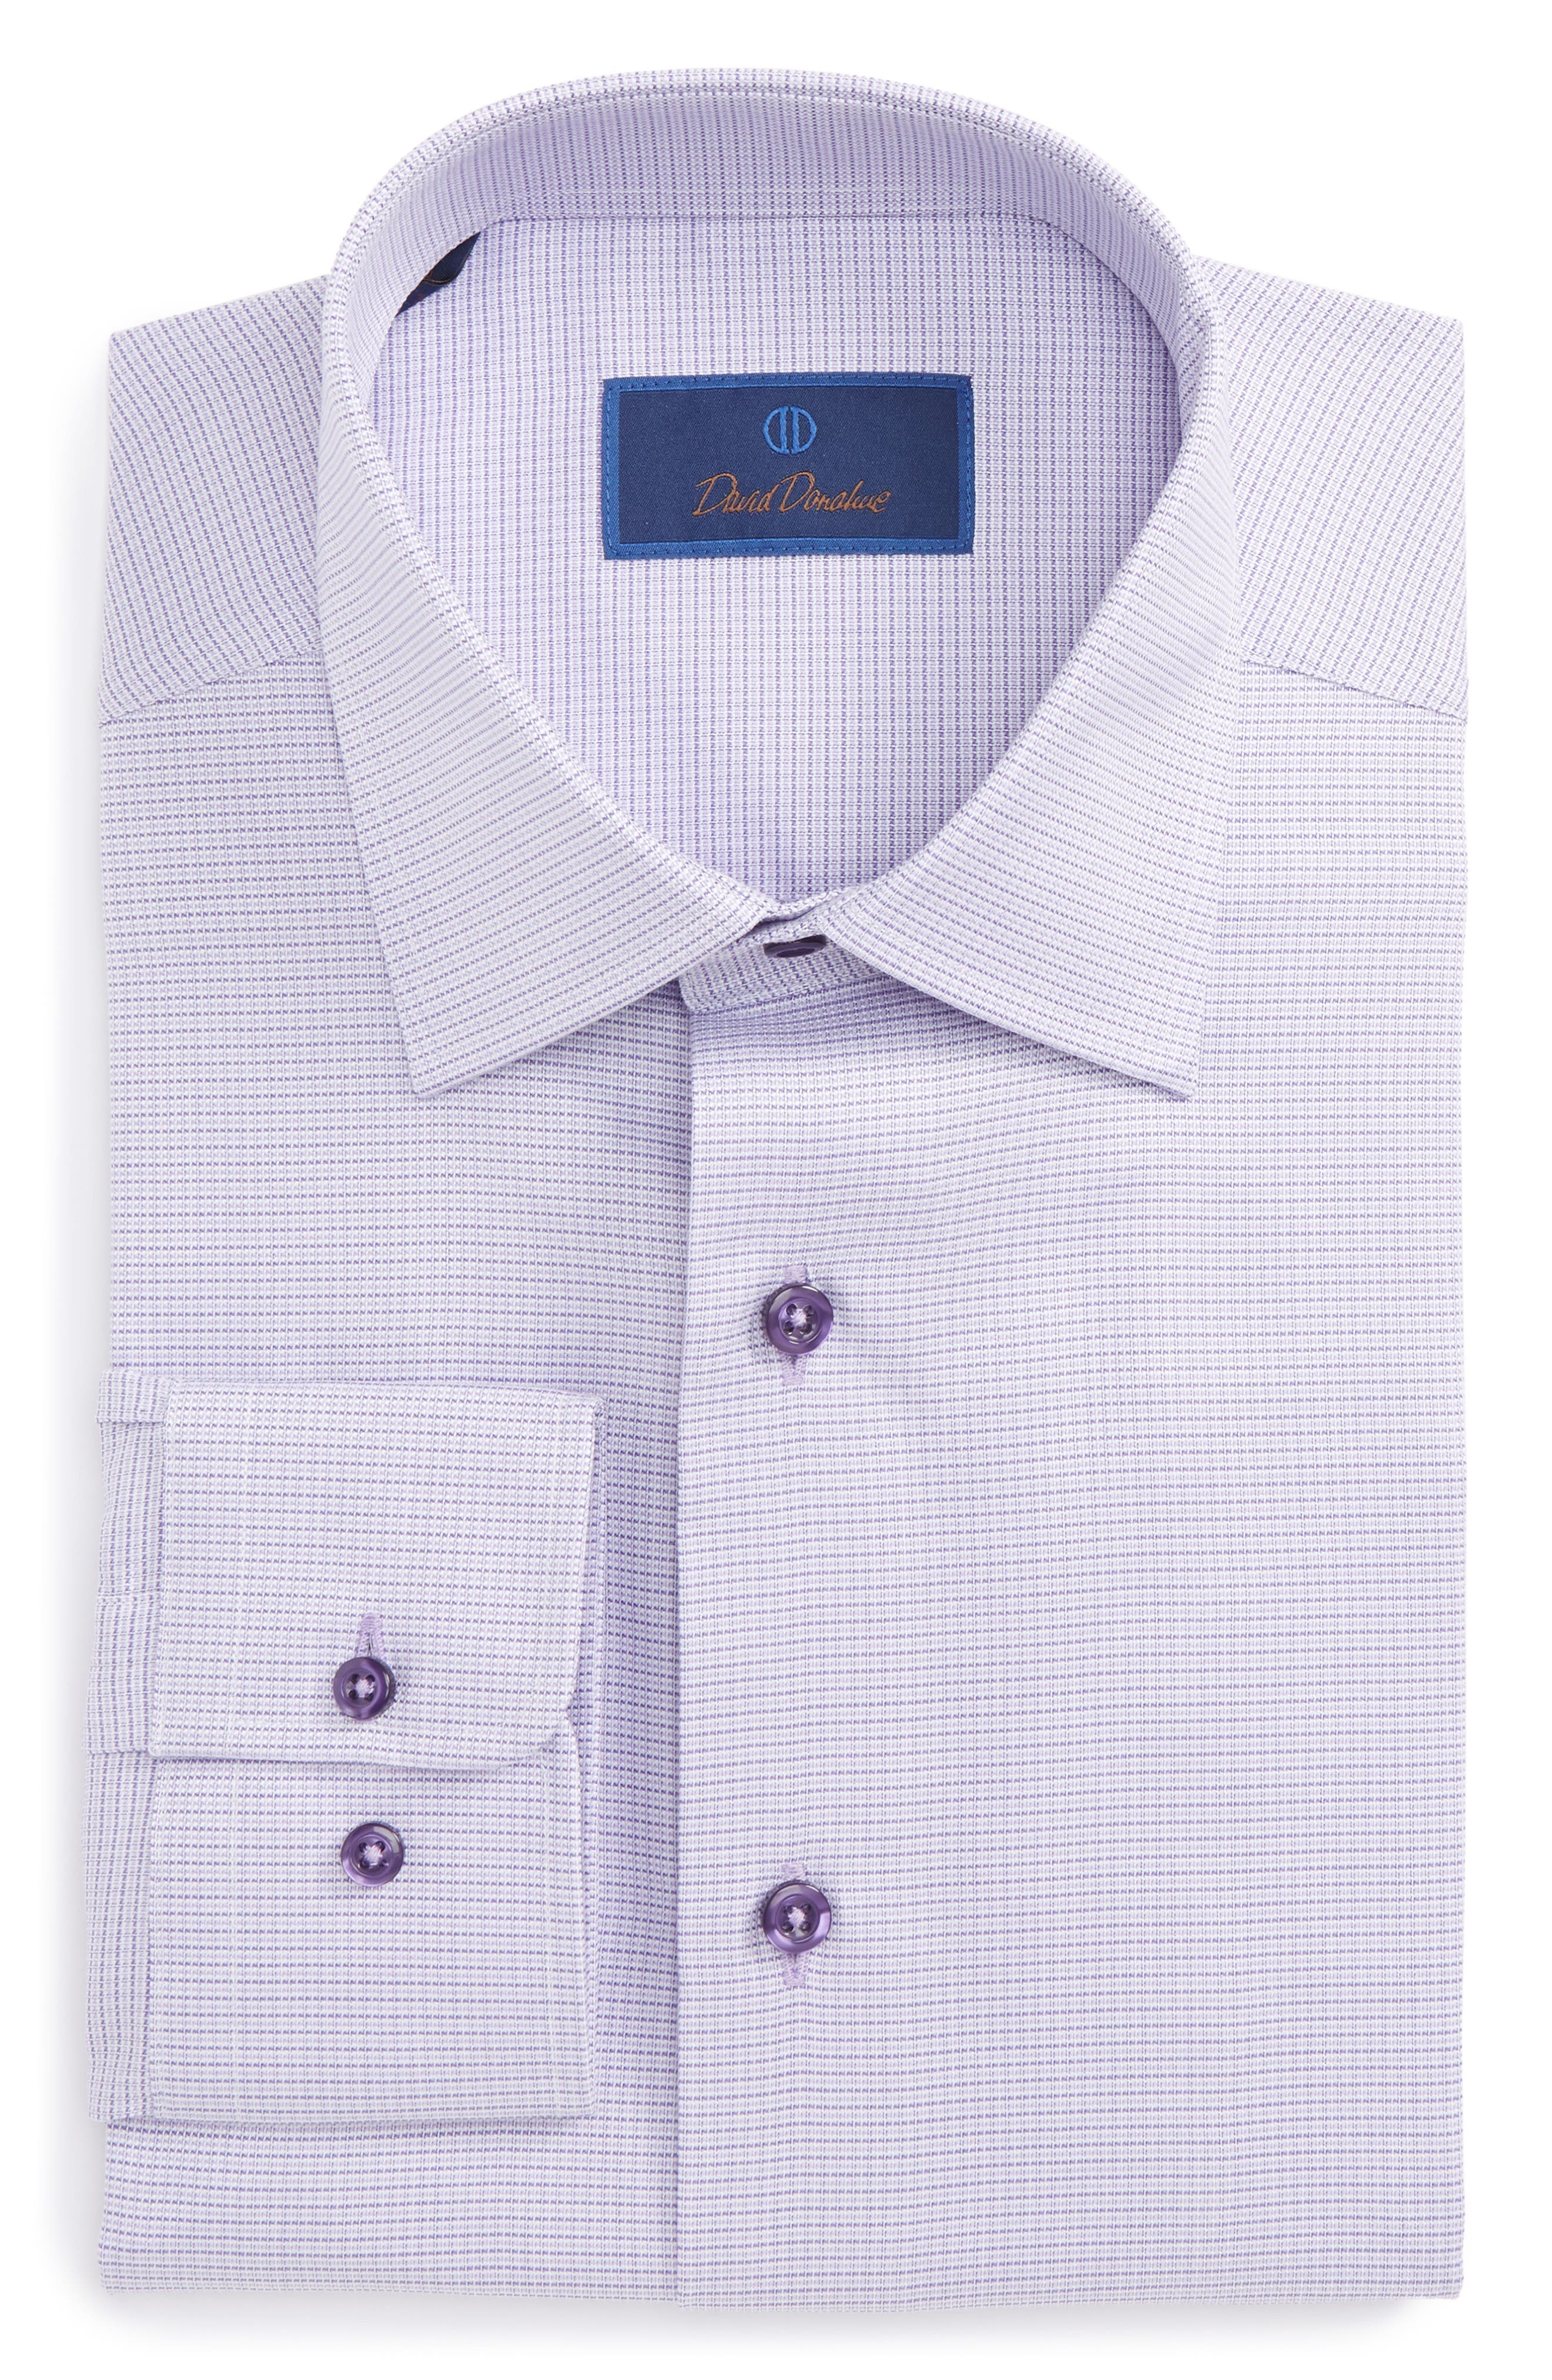 Regular Fit Solid Dress Shirt,                         Main,                         color,